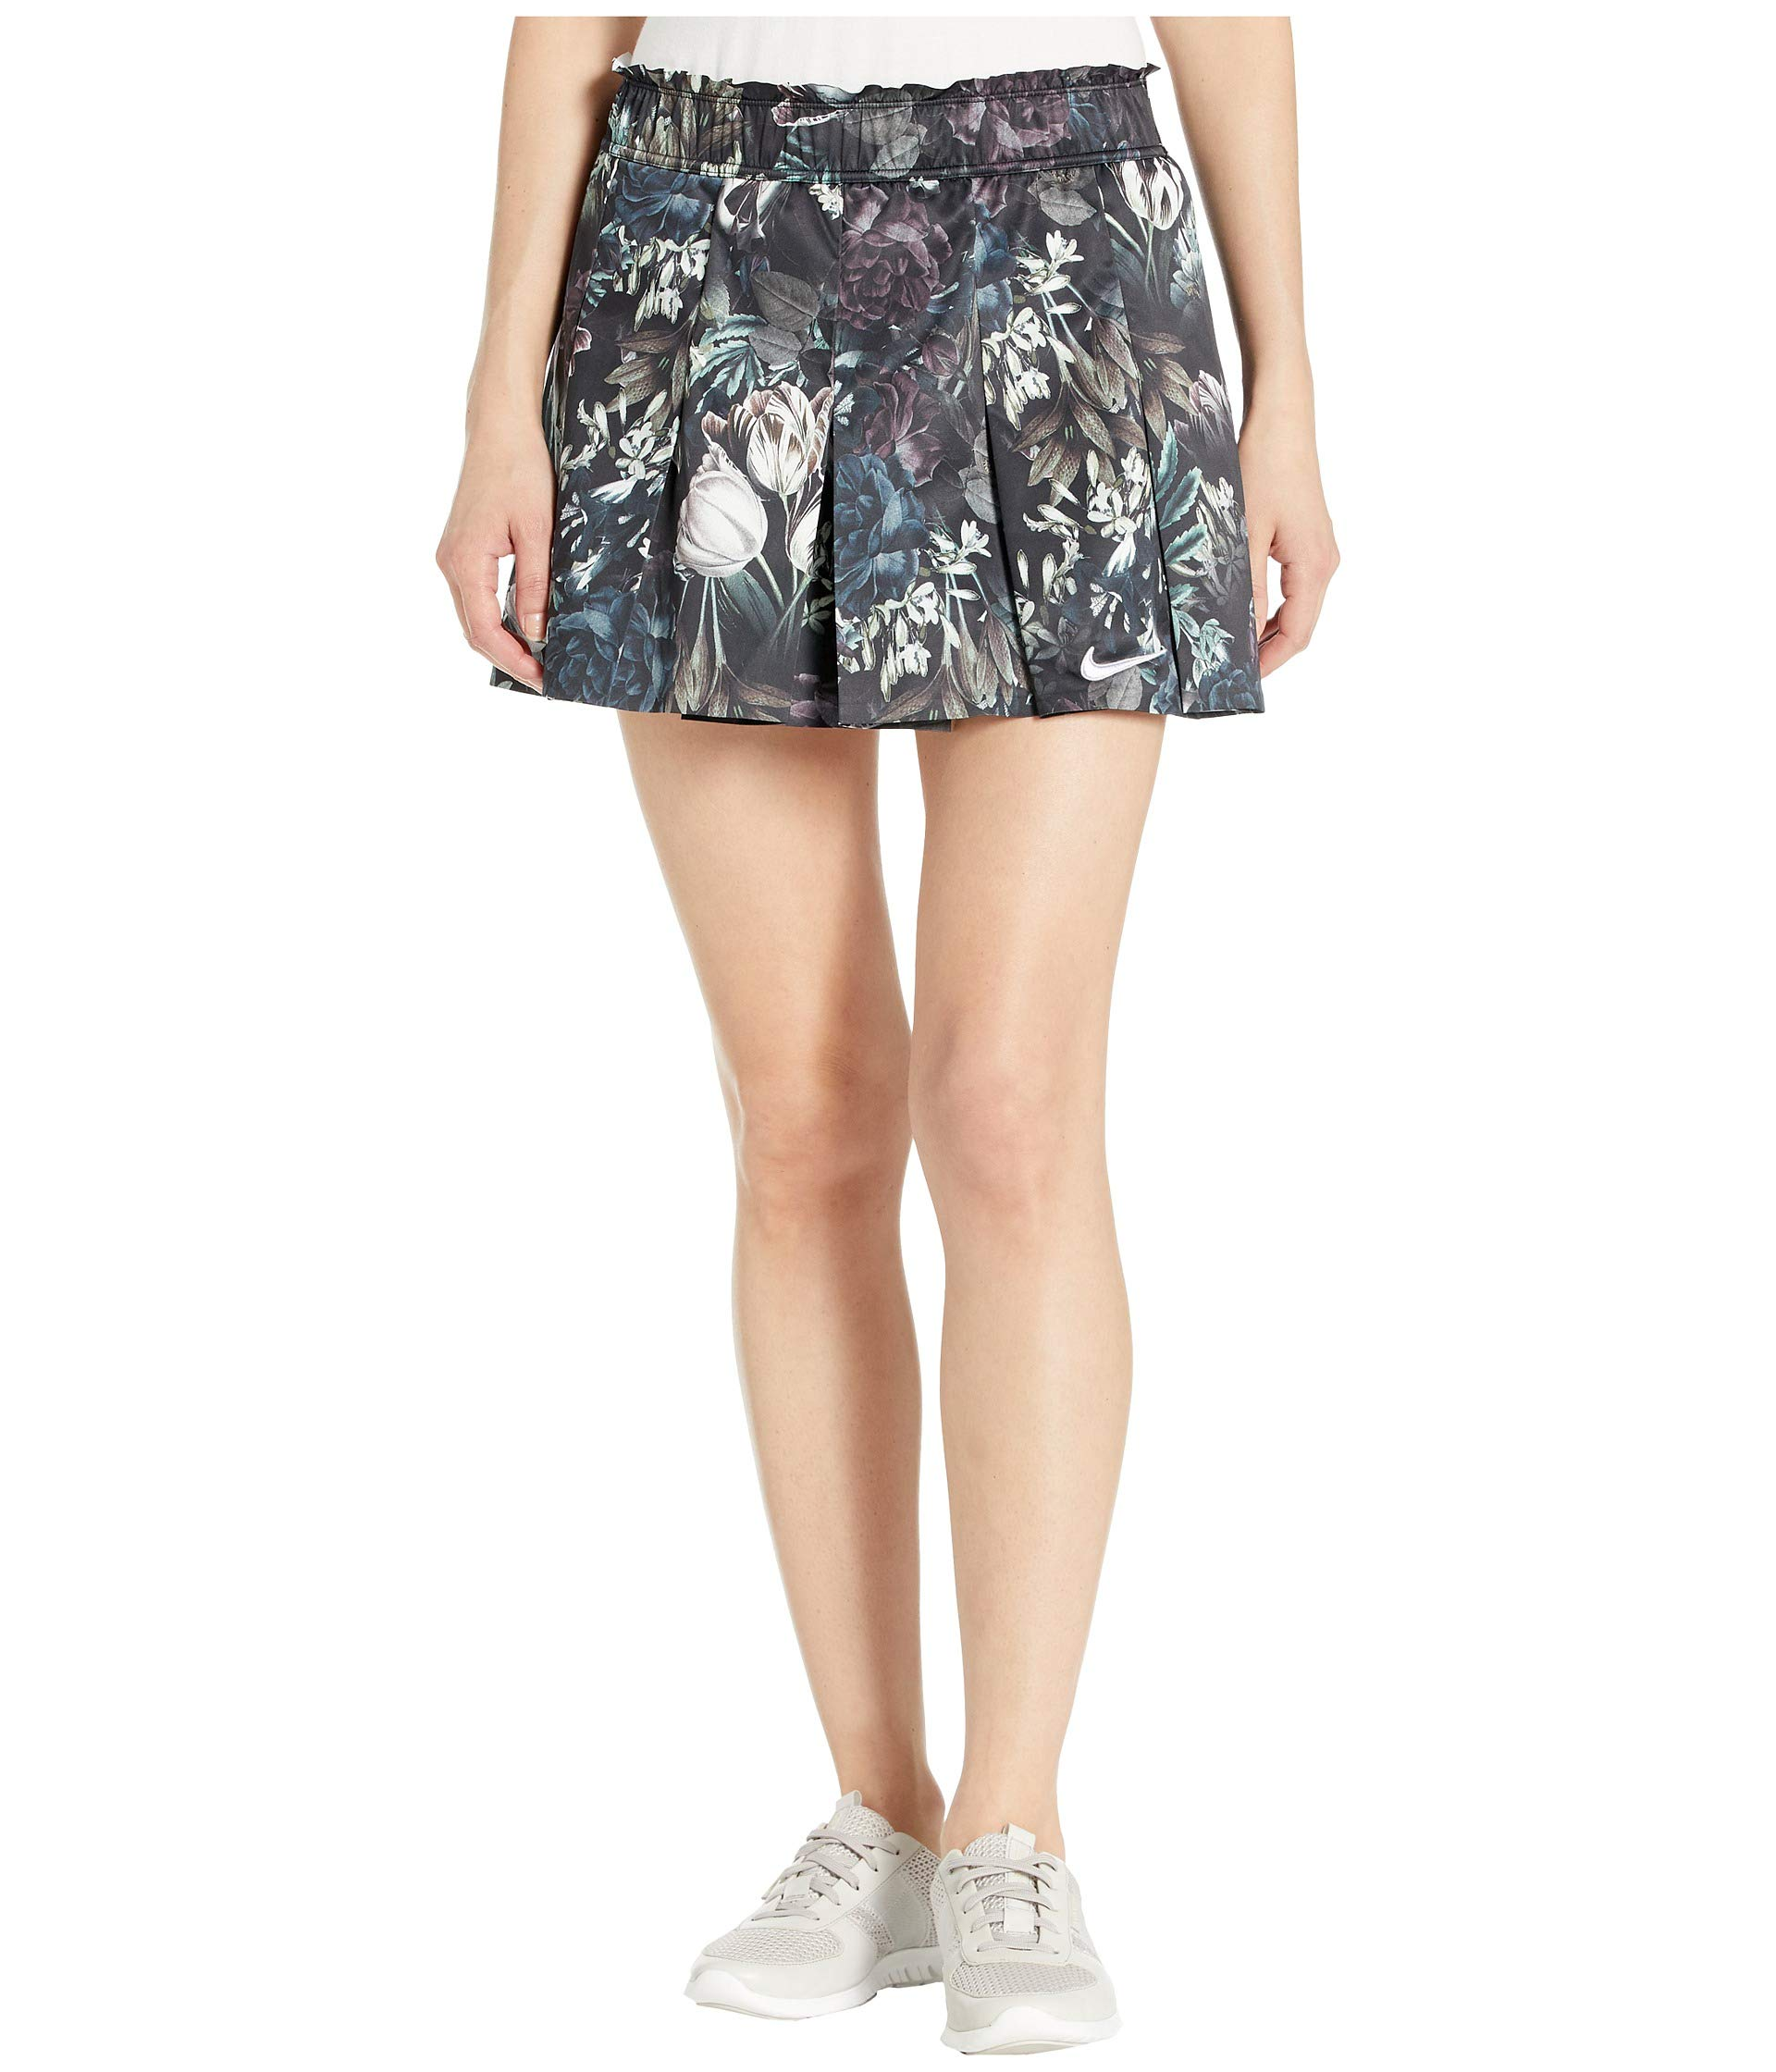 Nike W Nkct FLX Skirt Ps Nt Womens Tennis AO0370-010, Black/Oxygen Purple/Green/White/Blue/Grey, Size US M by Nike